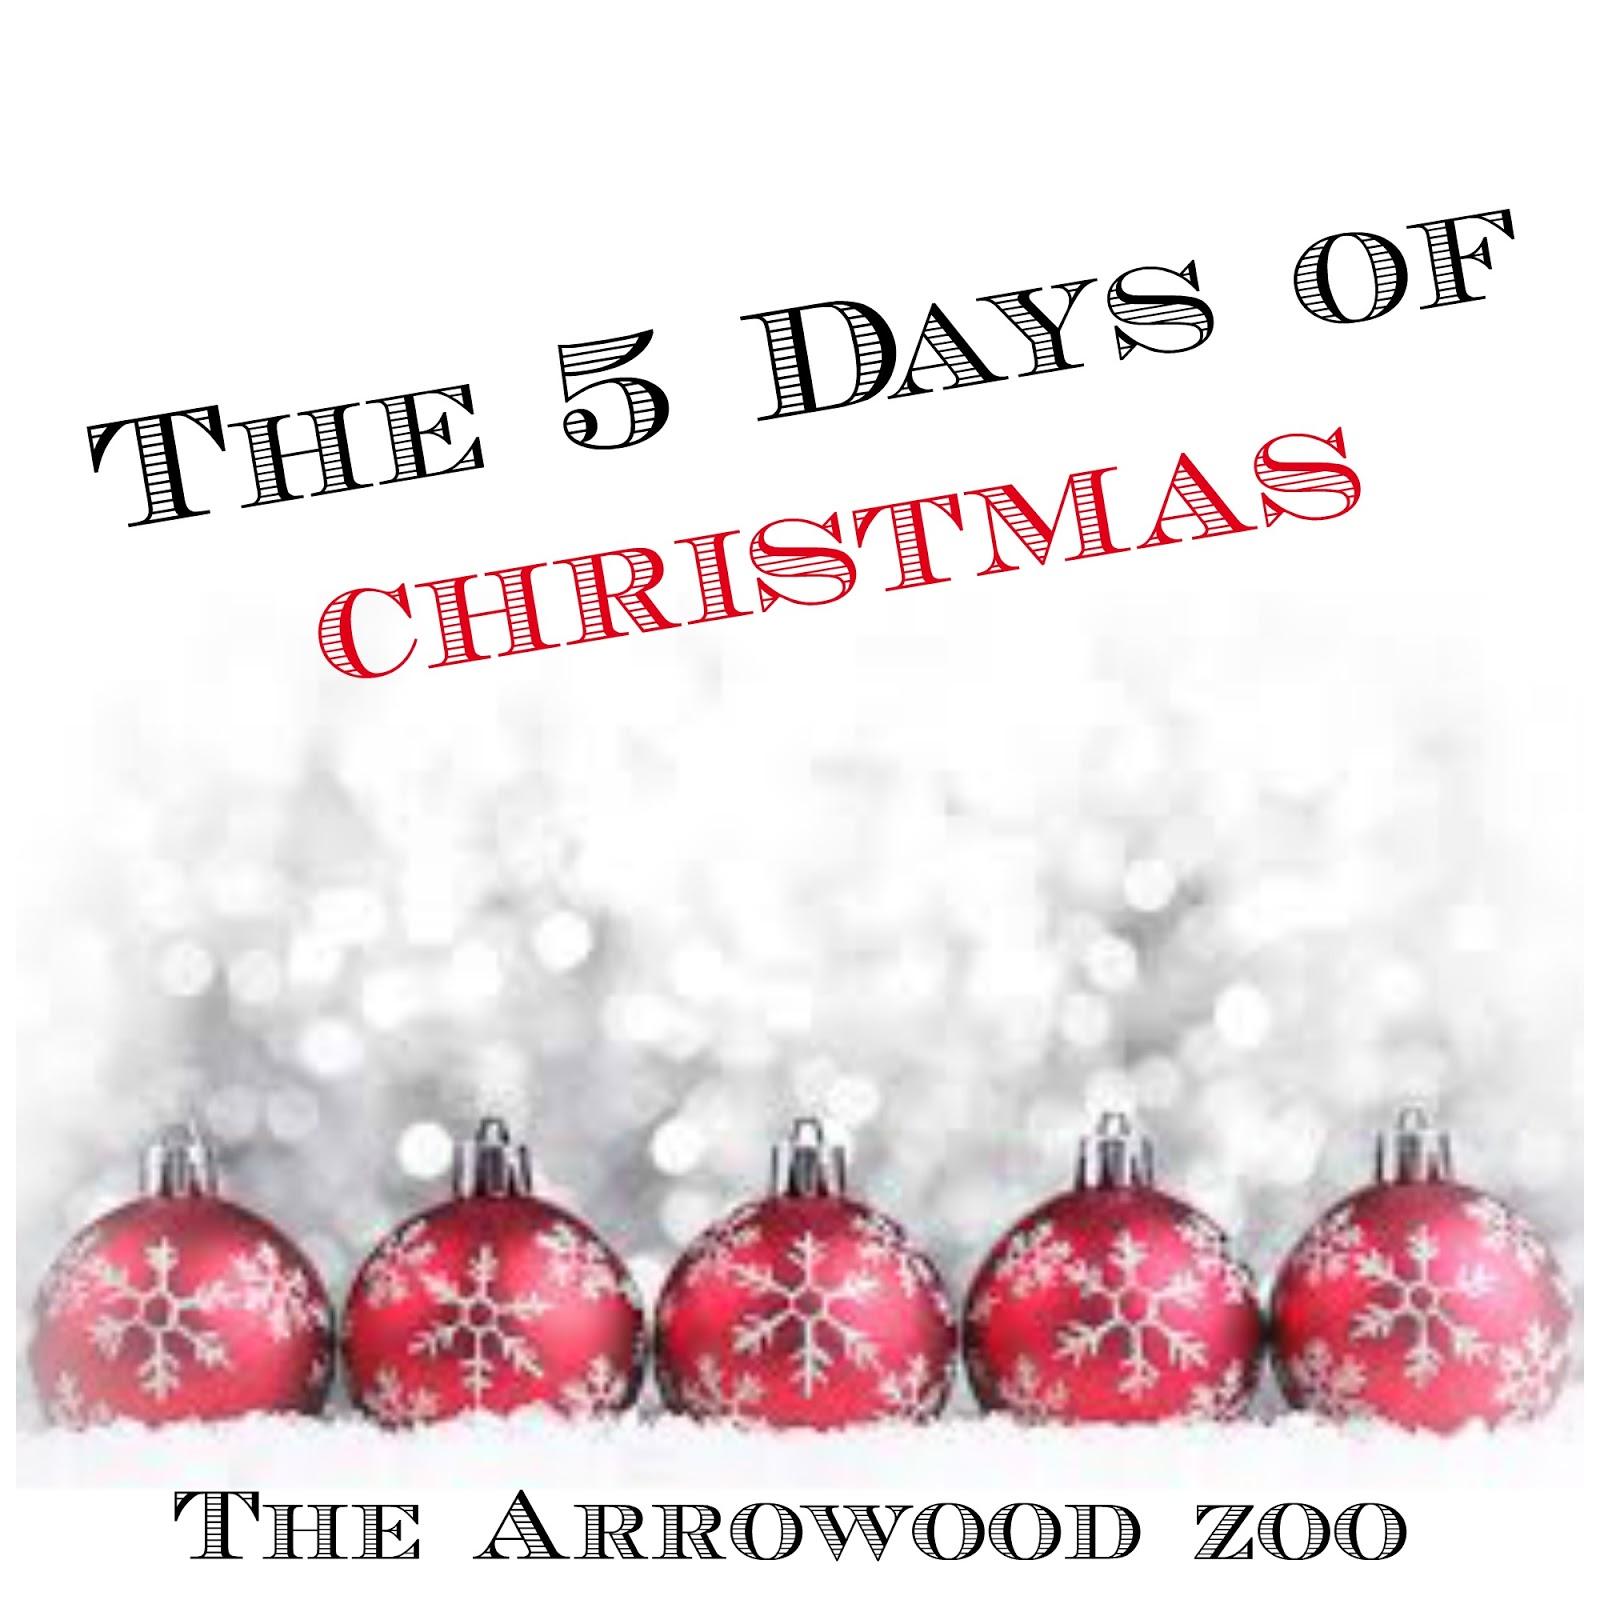 The Arrowood Zoo: Christmas Treats - 5 Days of Christmas